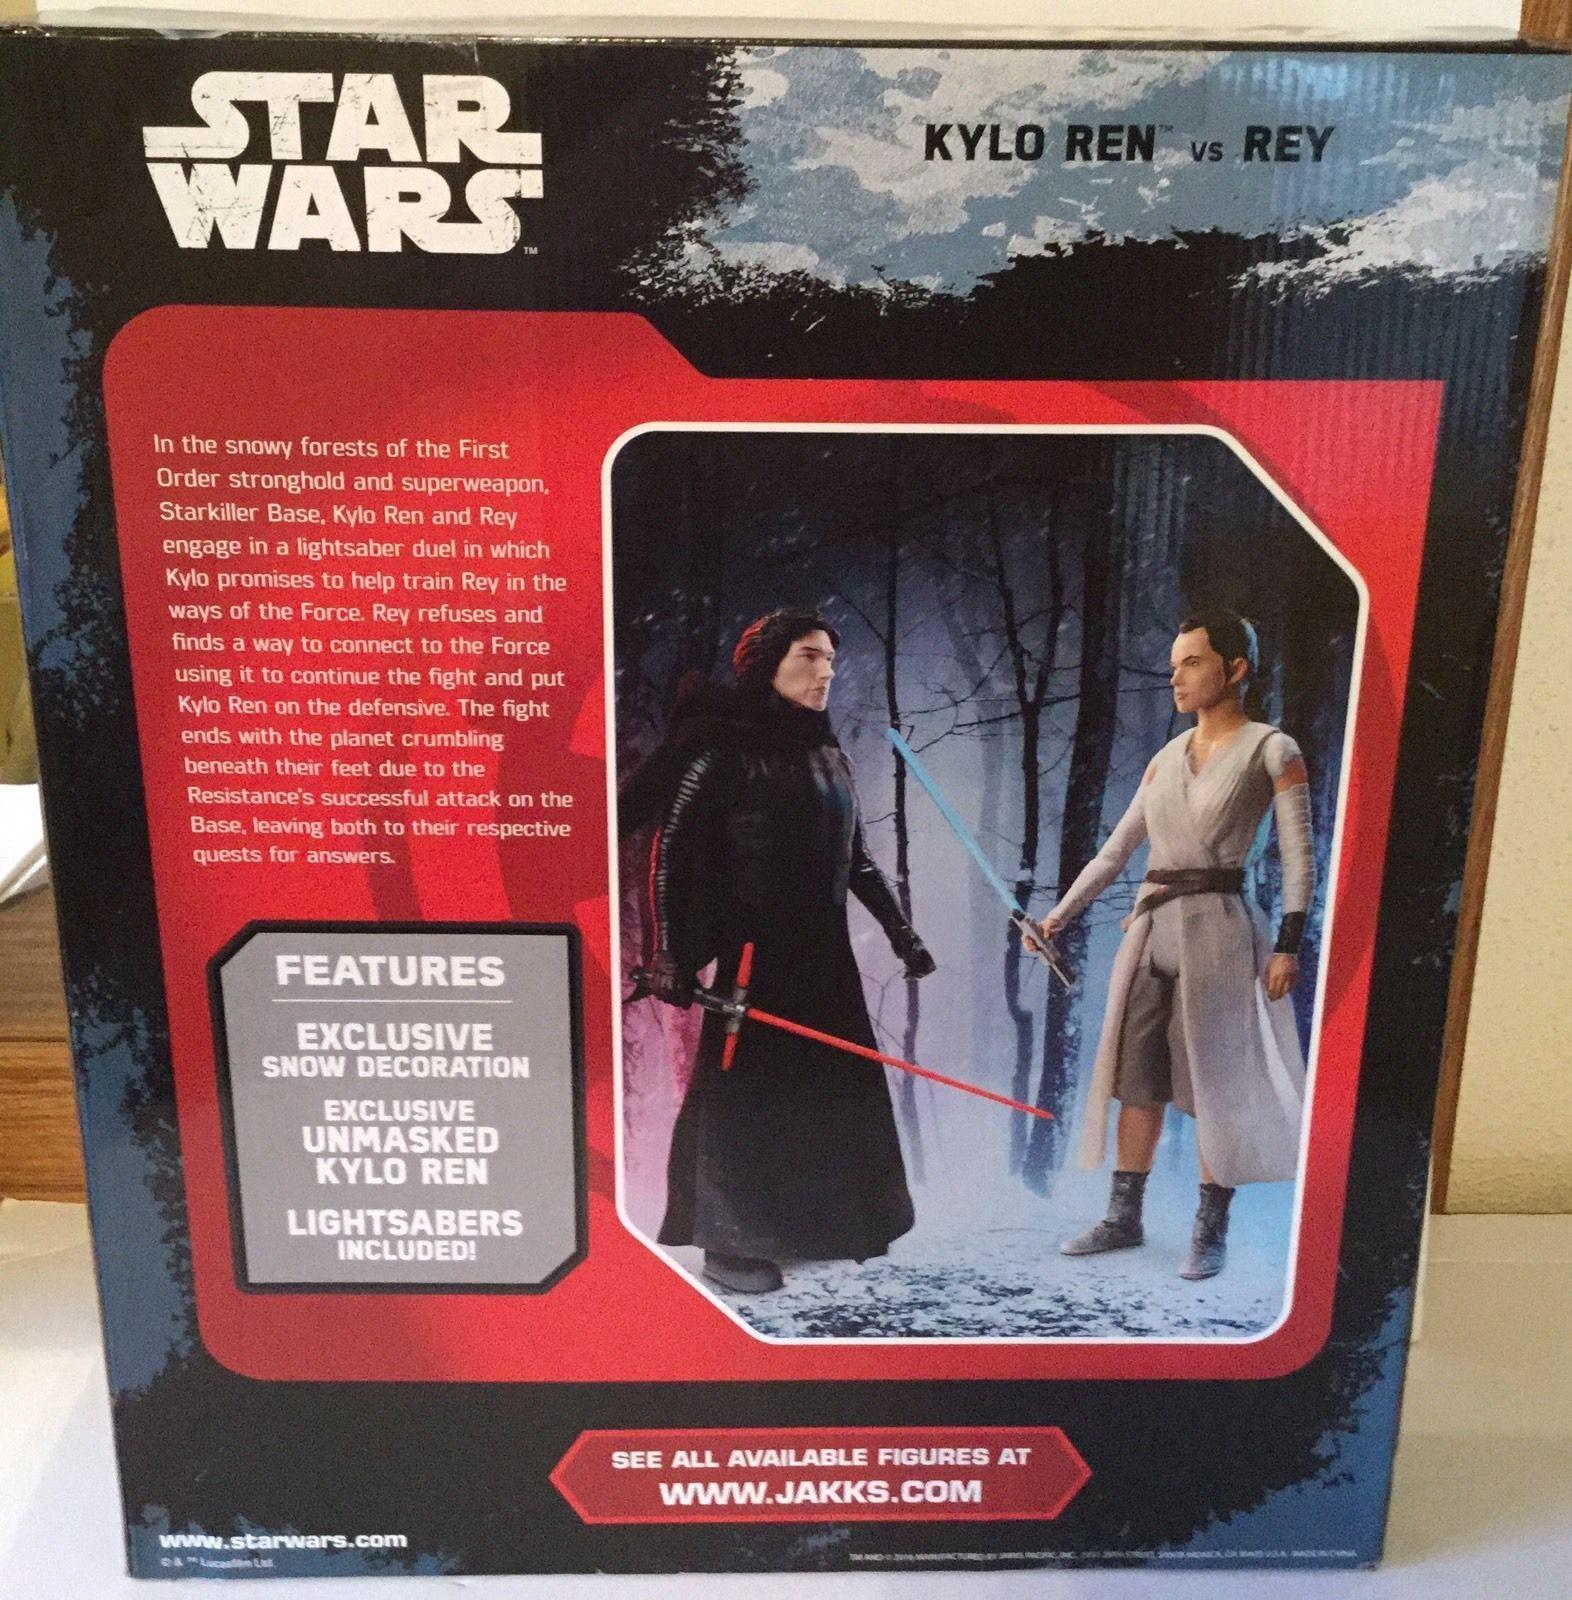 "Star Wars Big Figs KYLO REN vs REY - Starkiller Base Showdown 18"" Action Figures"